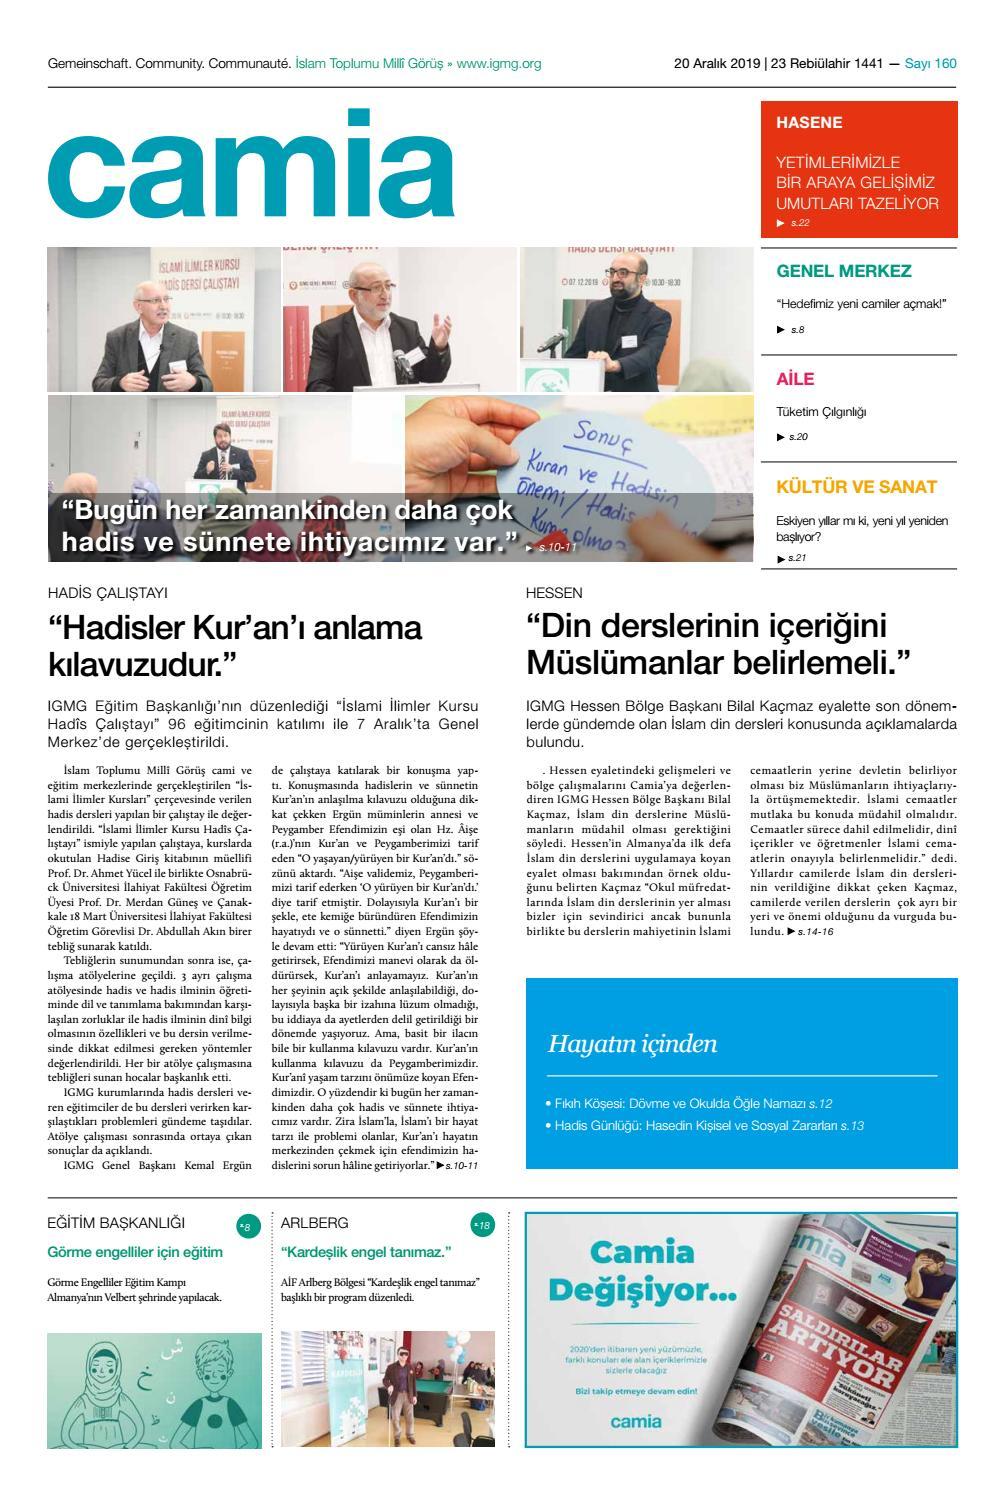 hannover namaz vakitleri 2019